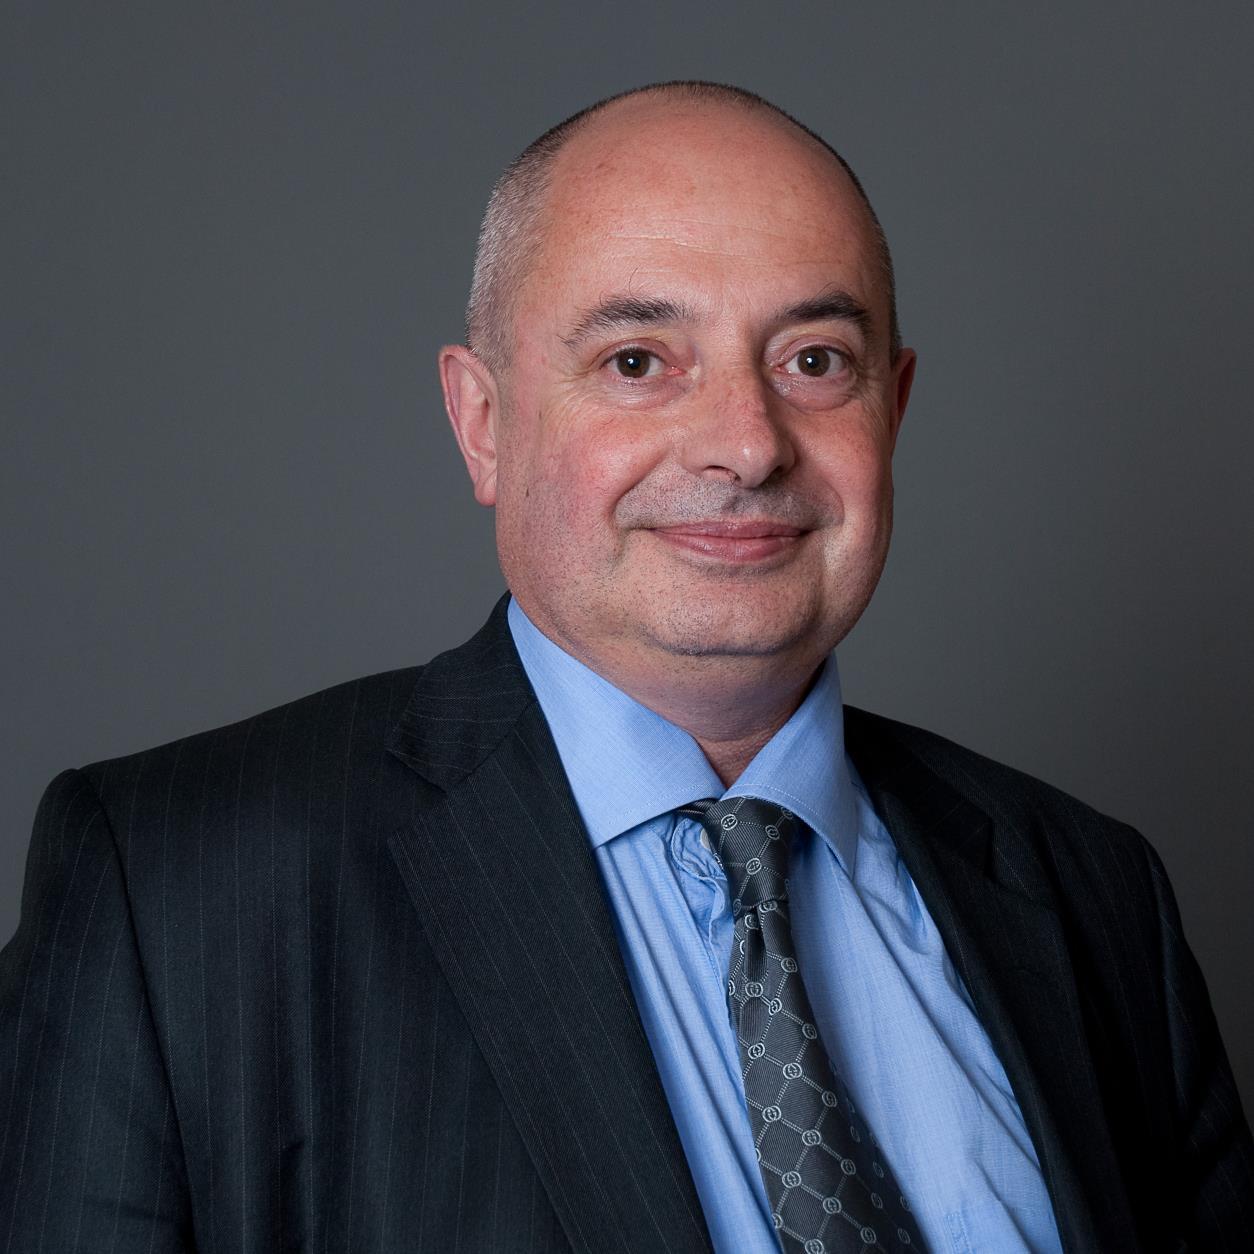 Jean-Pierre Maulny